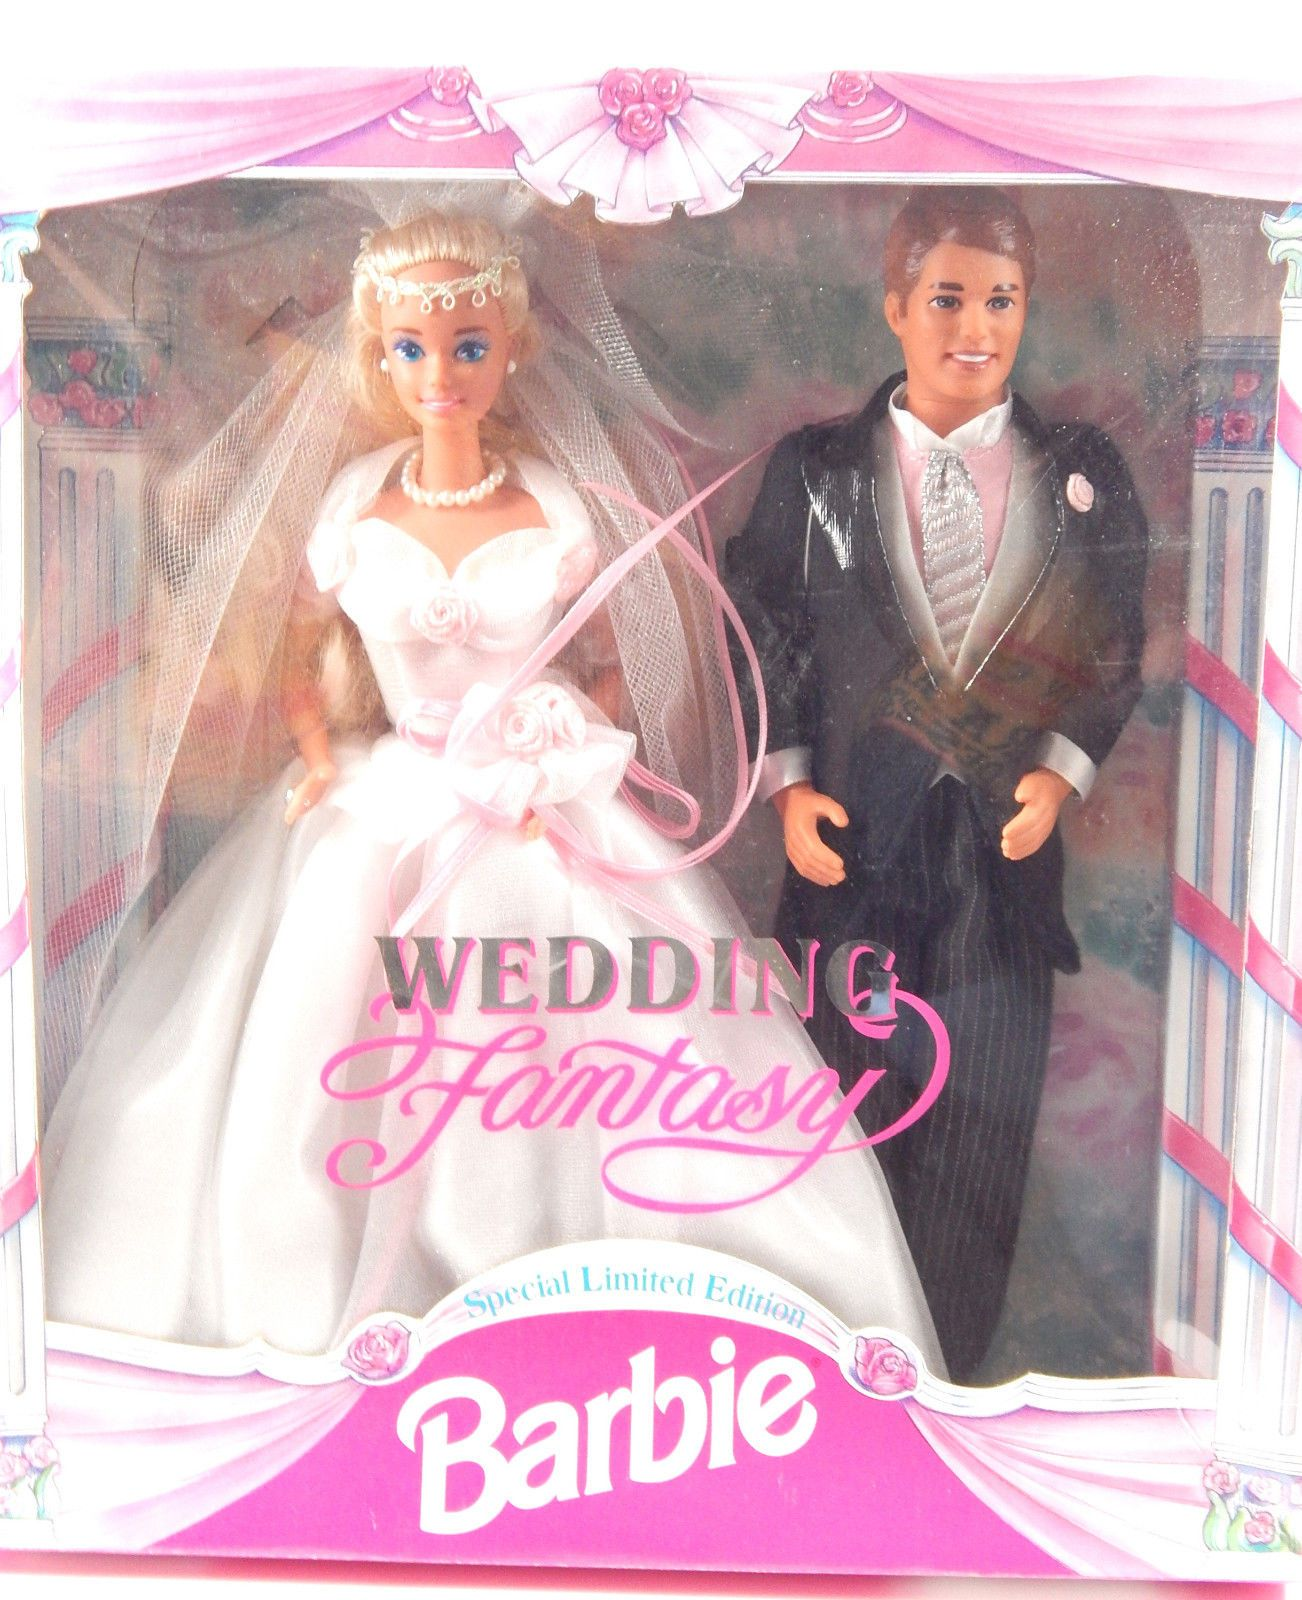 Barbie and Ken Wedding Set Toys & Games